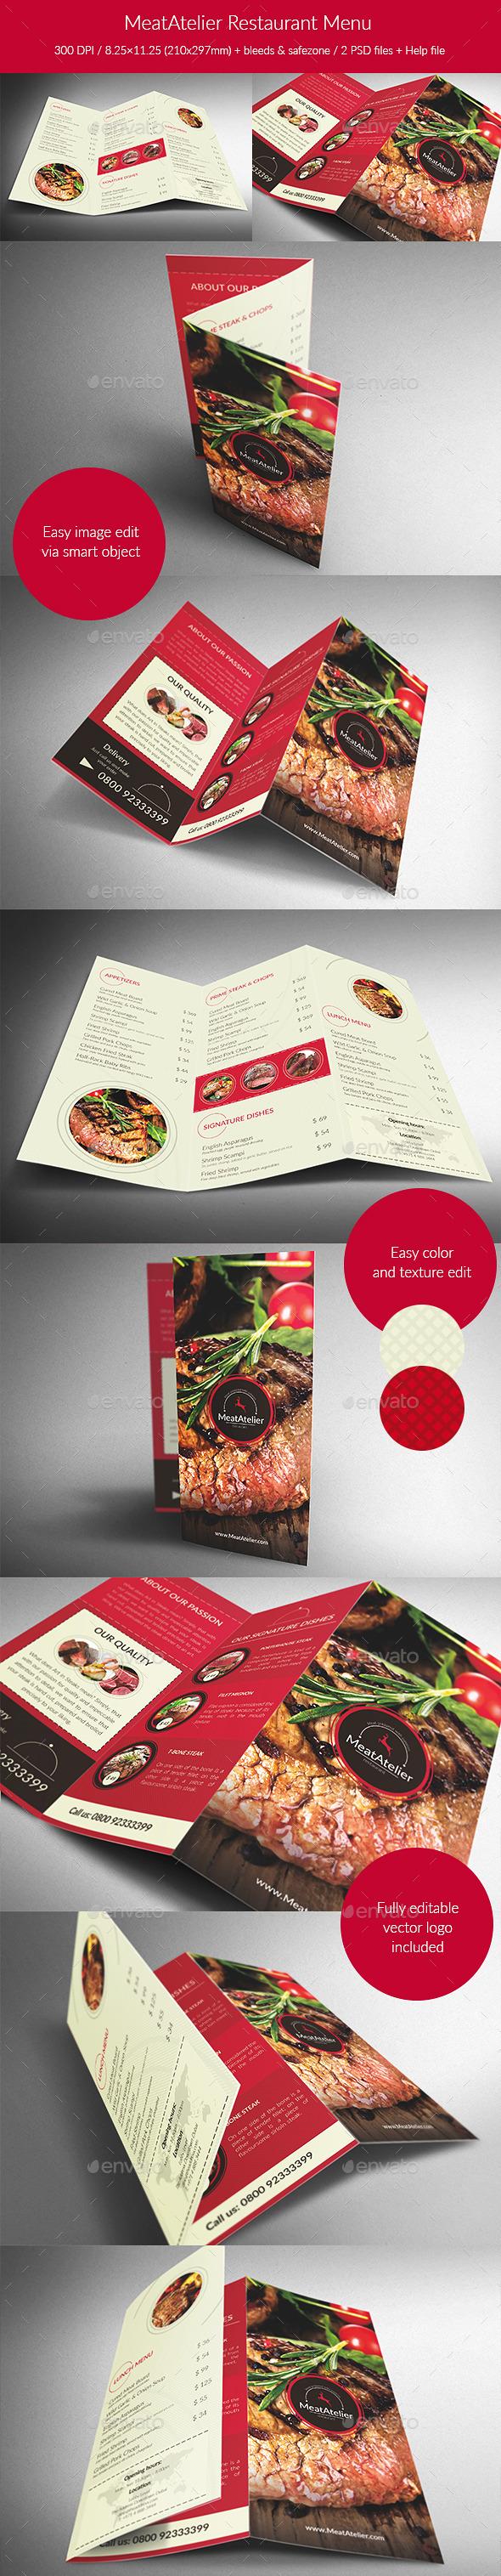 MeatAtelier Restaurant Menu